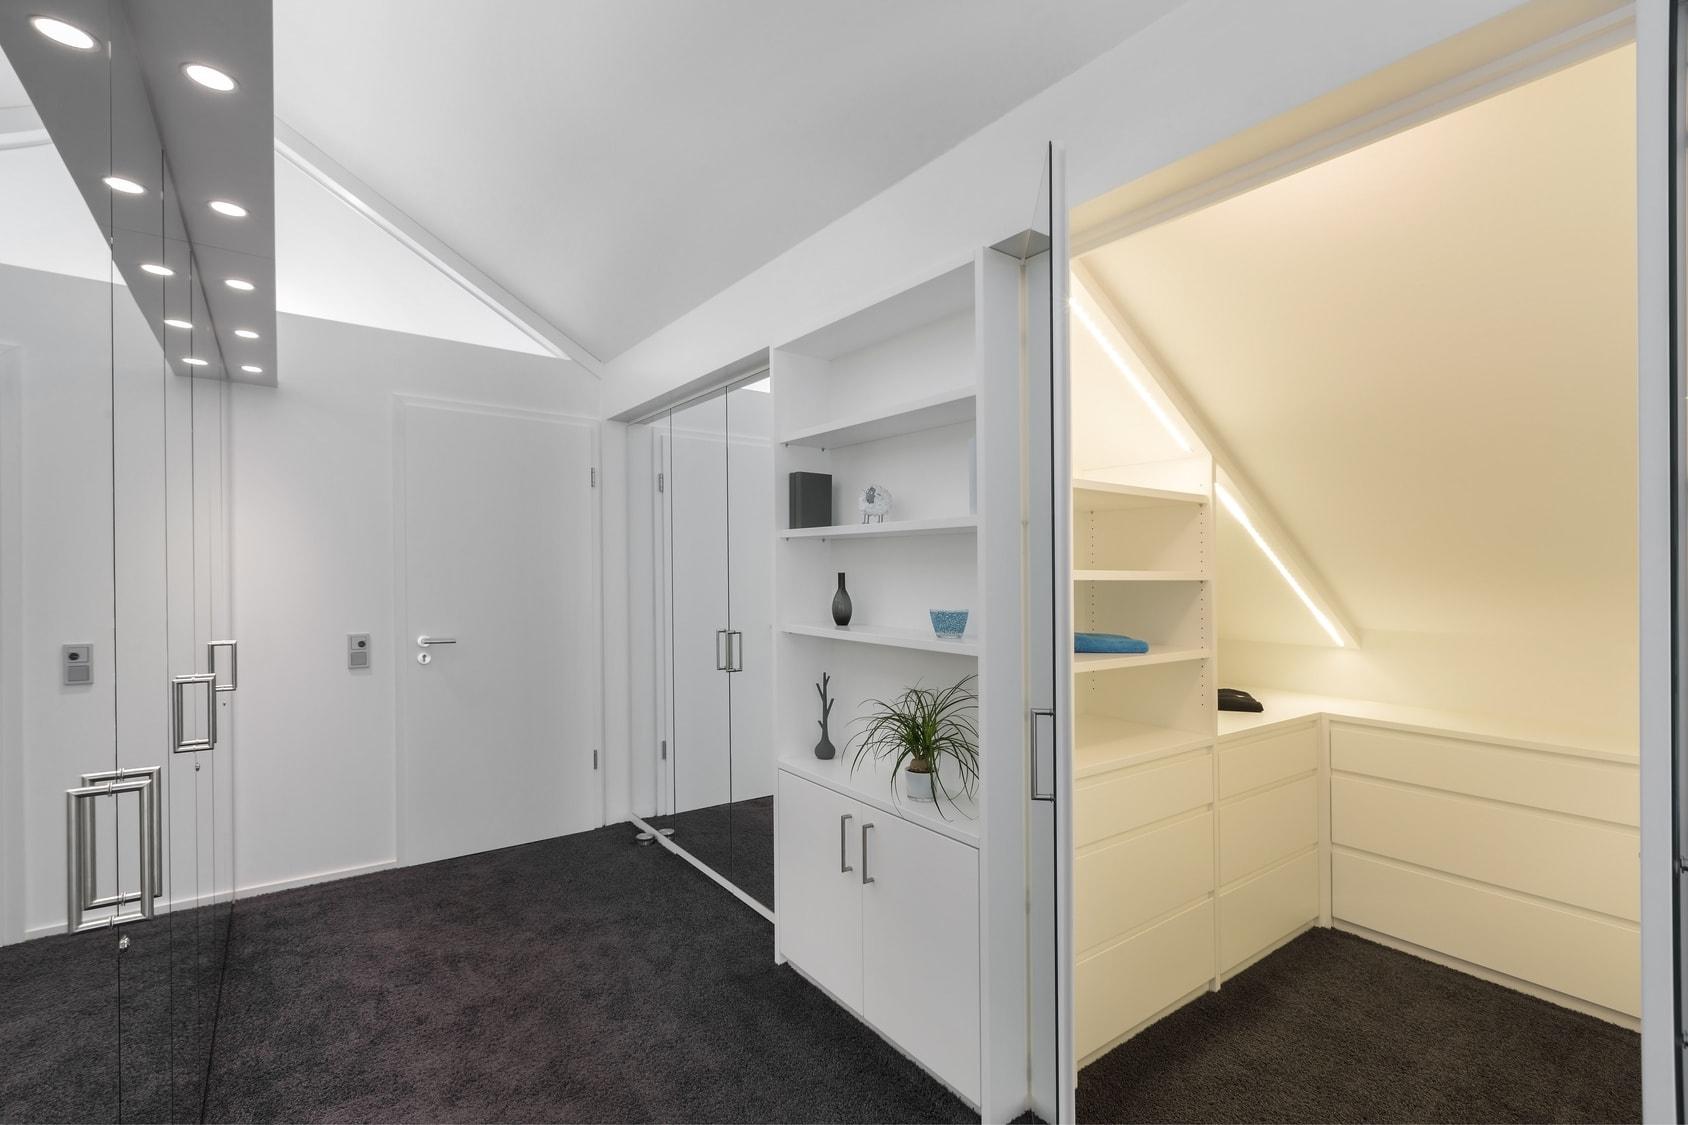 Beleuchtung Ankleidezimmer © Matthias Buehner / Fotolia